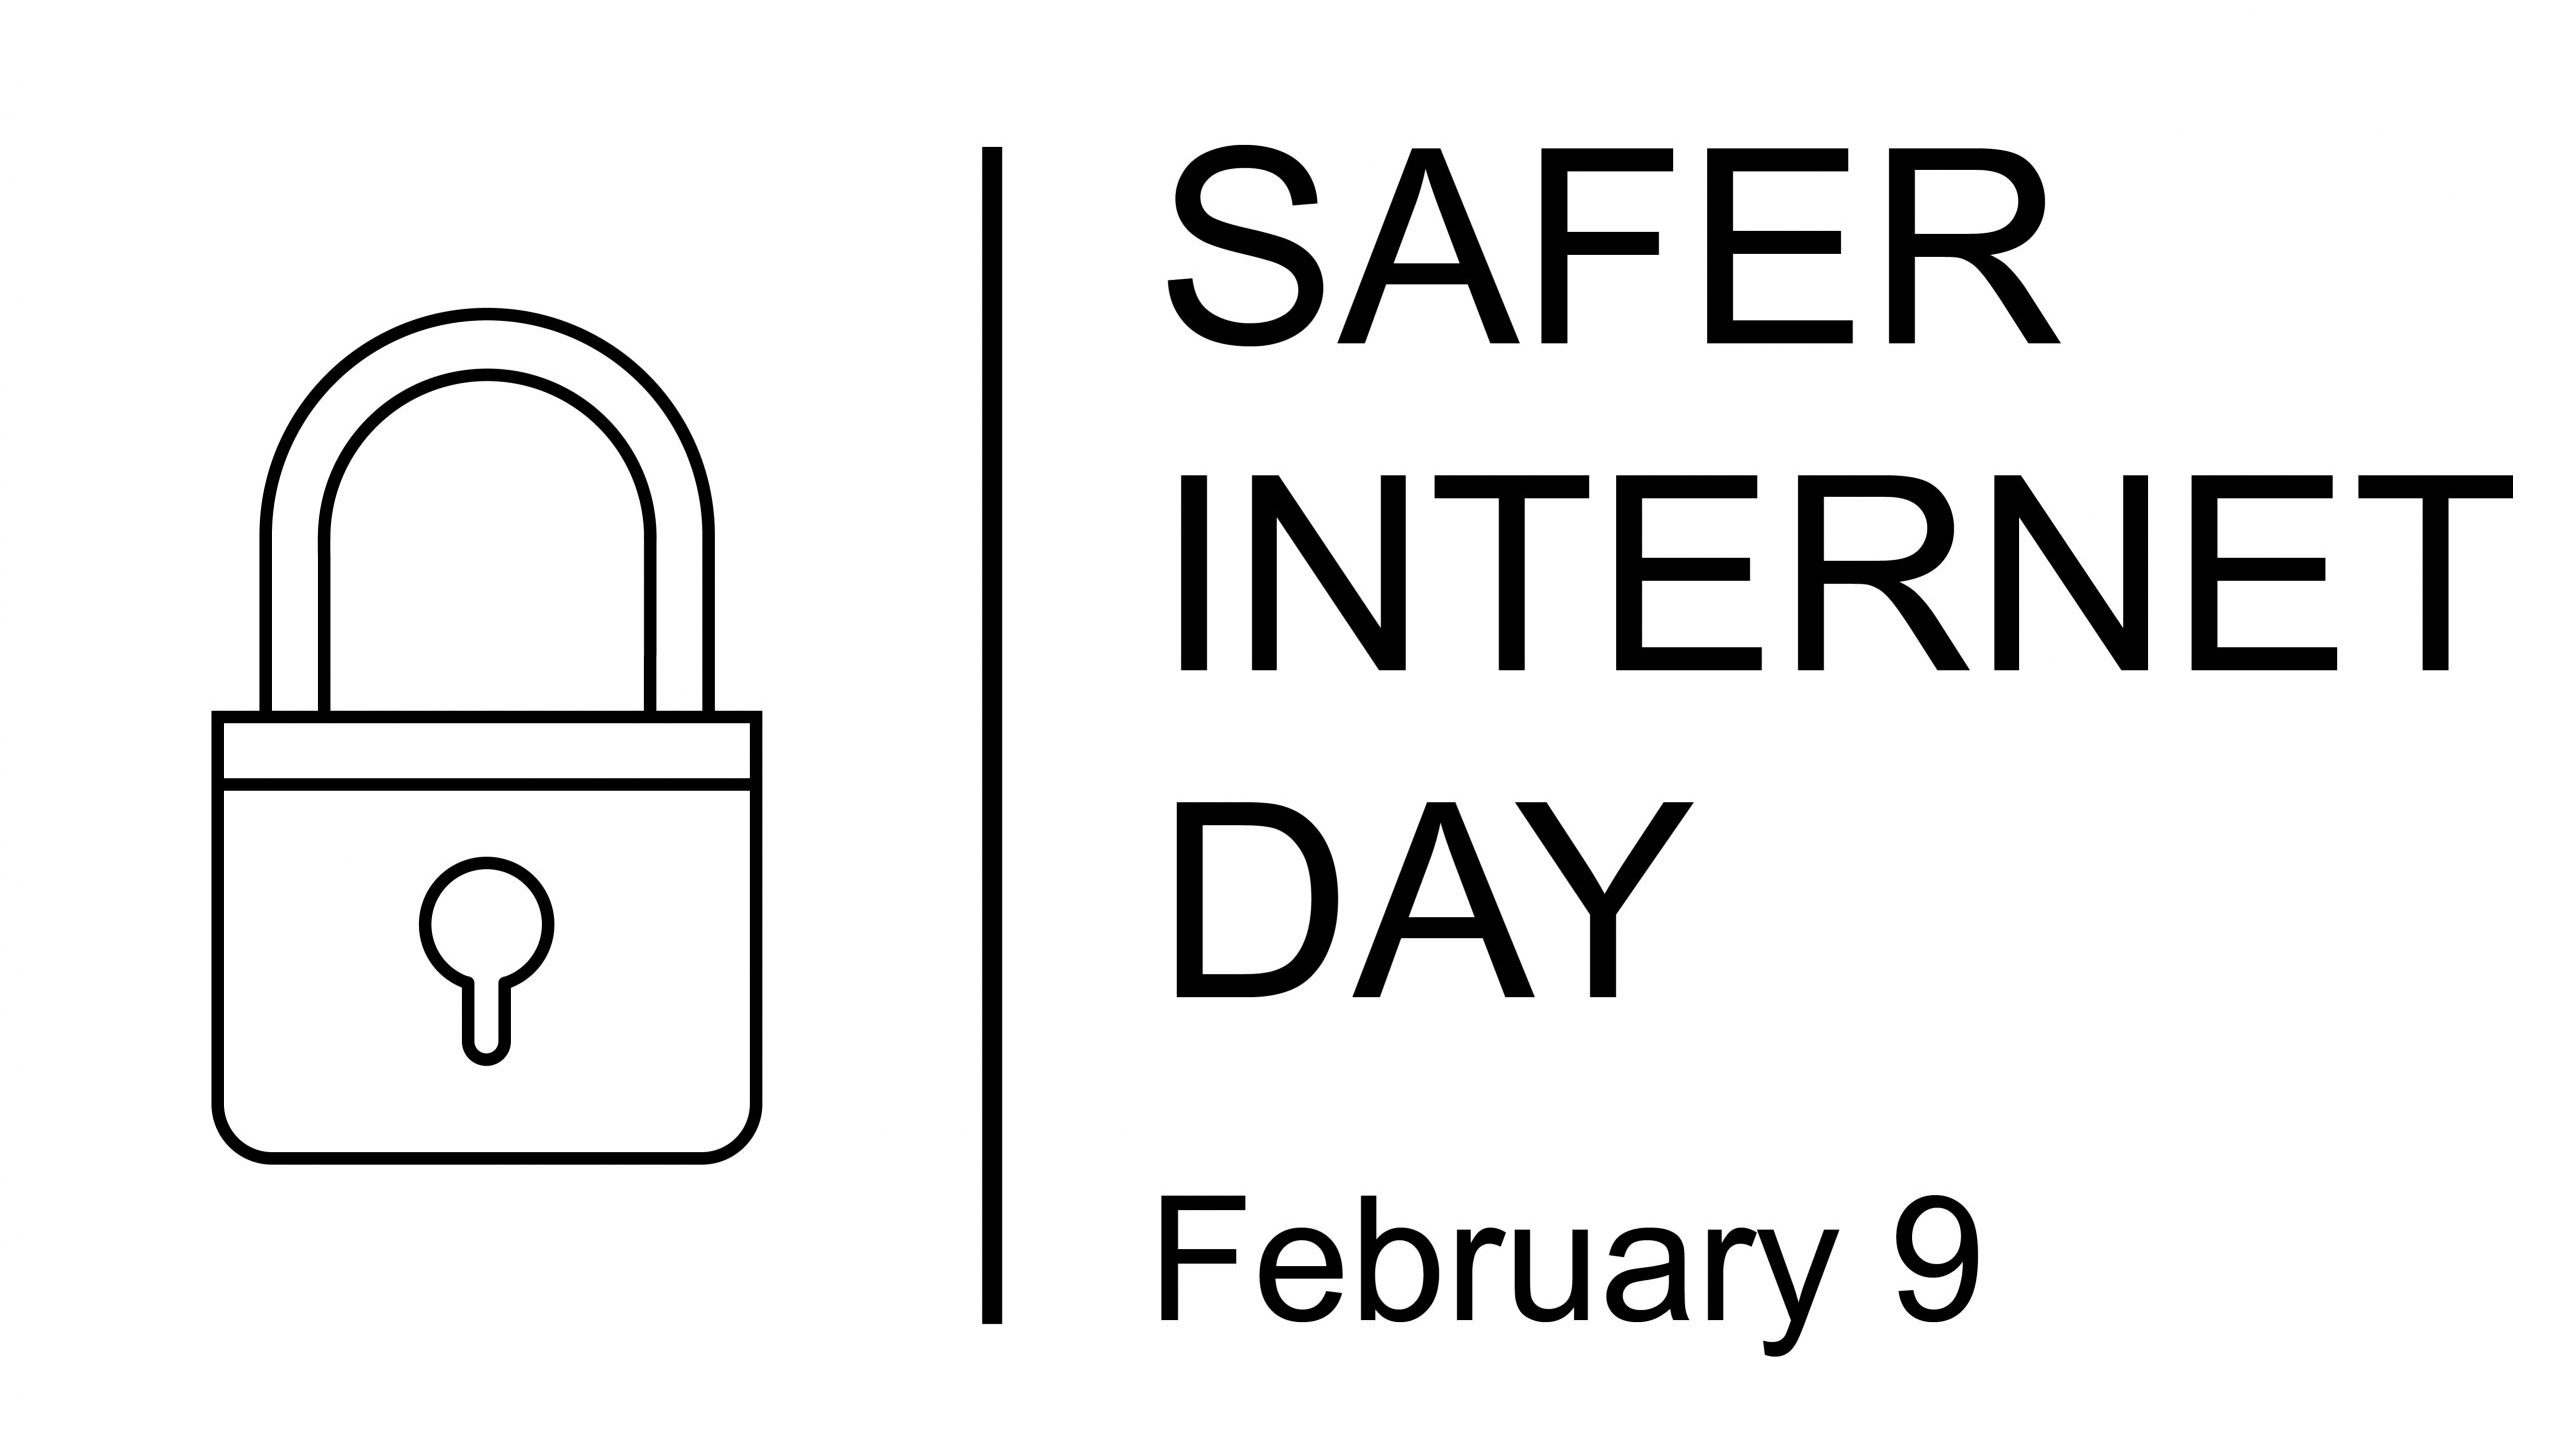 Safer Internet Day symbol, sign or logo. Padlock design. White background. Vector Illustration. February 9